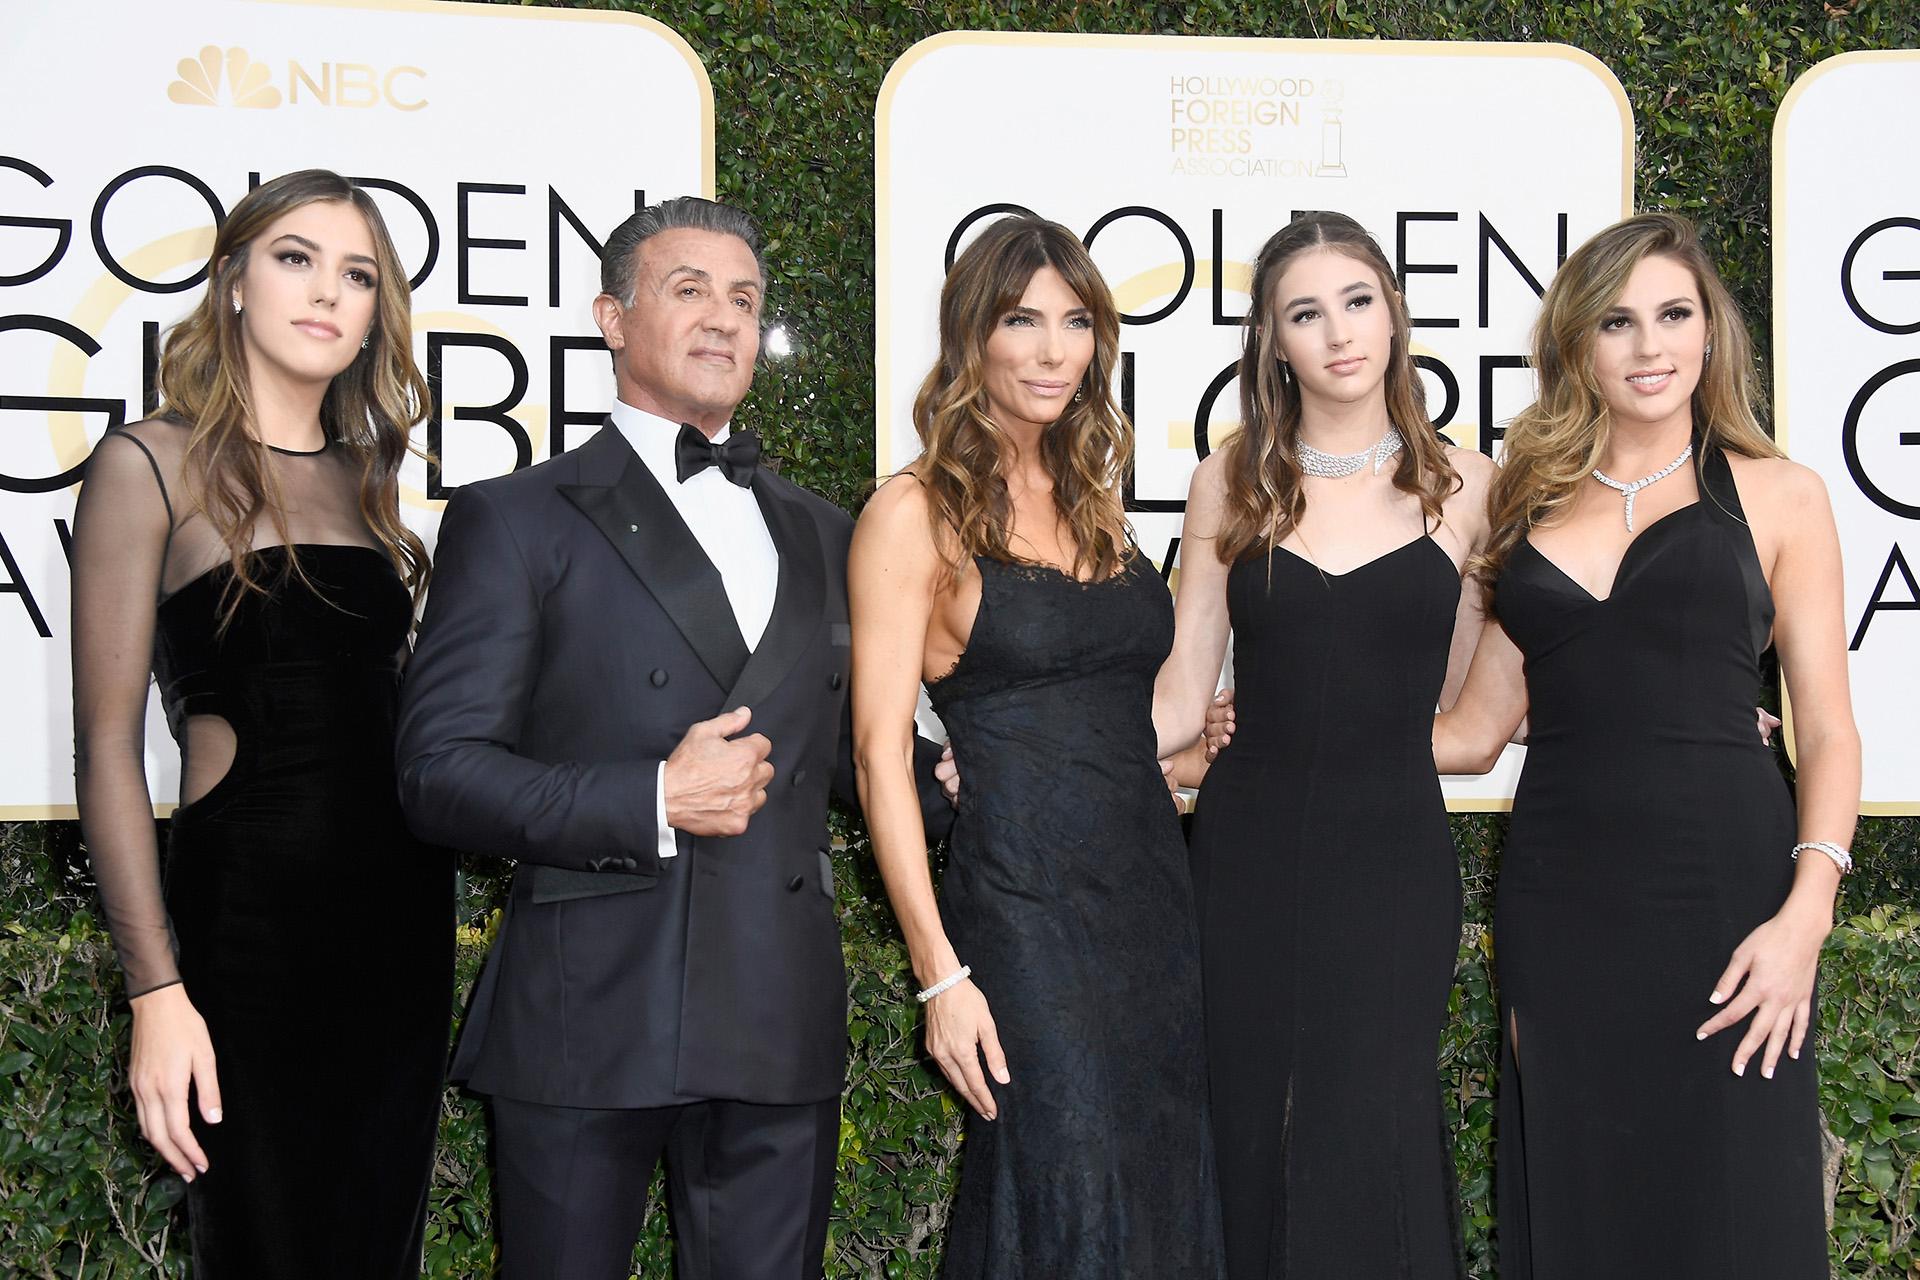 Sylvester Stallone junto a su mujer, Jennifer Flaviny sus hijas Sistine Stallone, Scarlet Stallone y Sophia Stallone